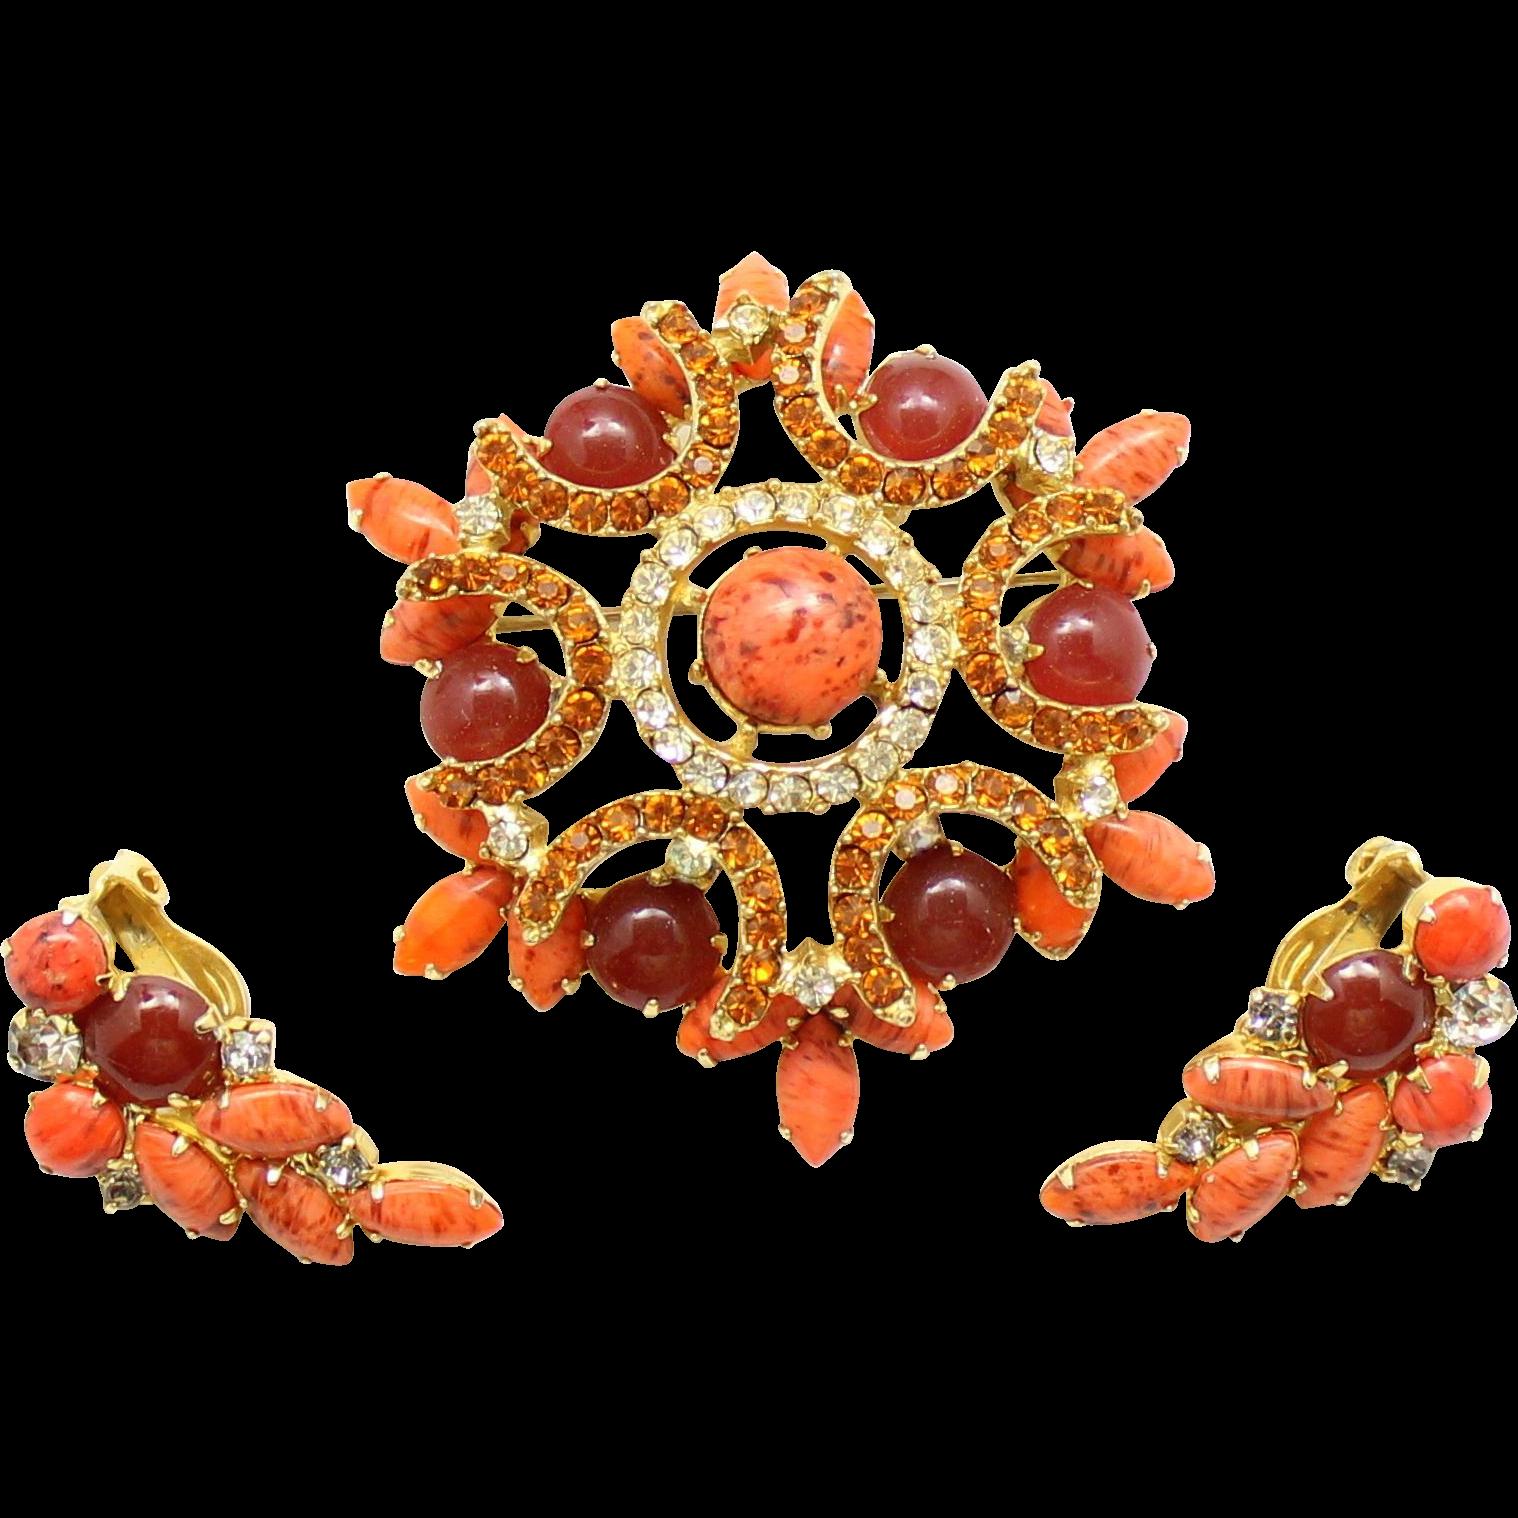 Vintage Juliana (D&E) Book Piece Coral, Carnelian Red Cabochon & Topaz Rhinestone Demi Parure